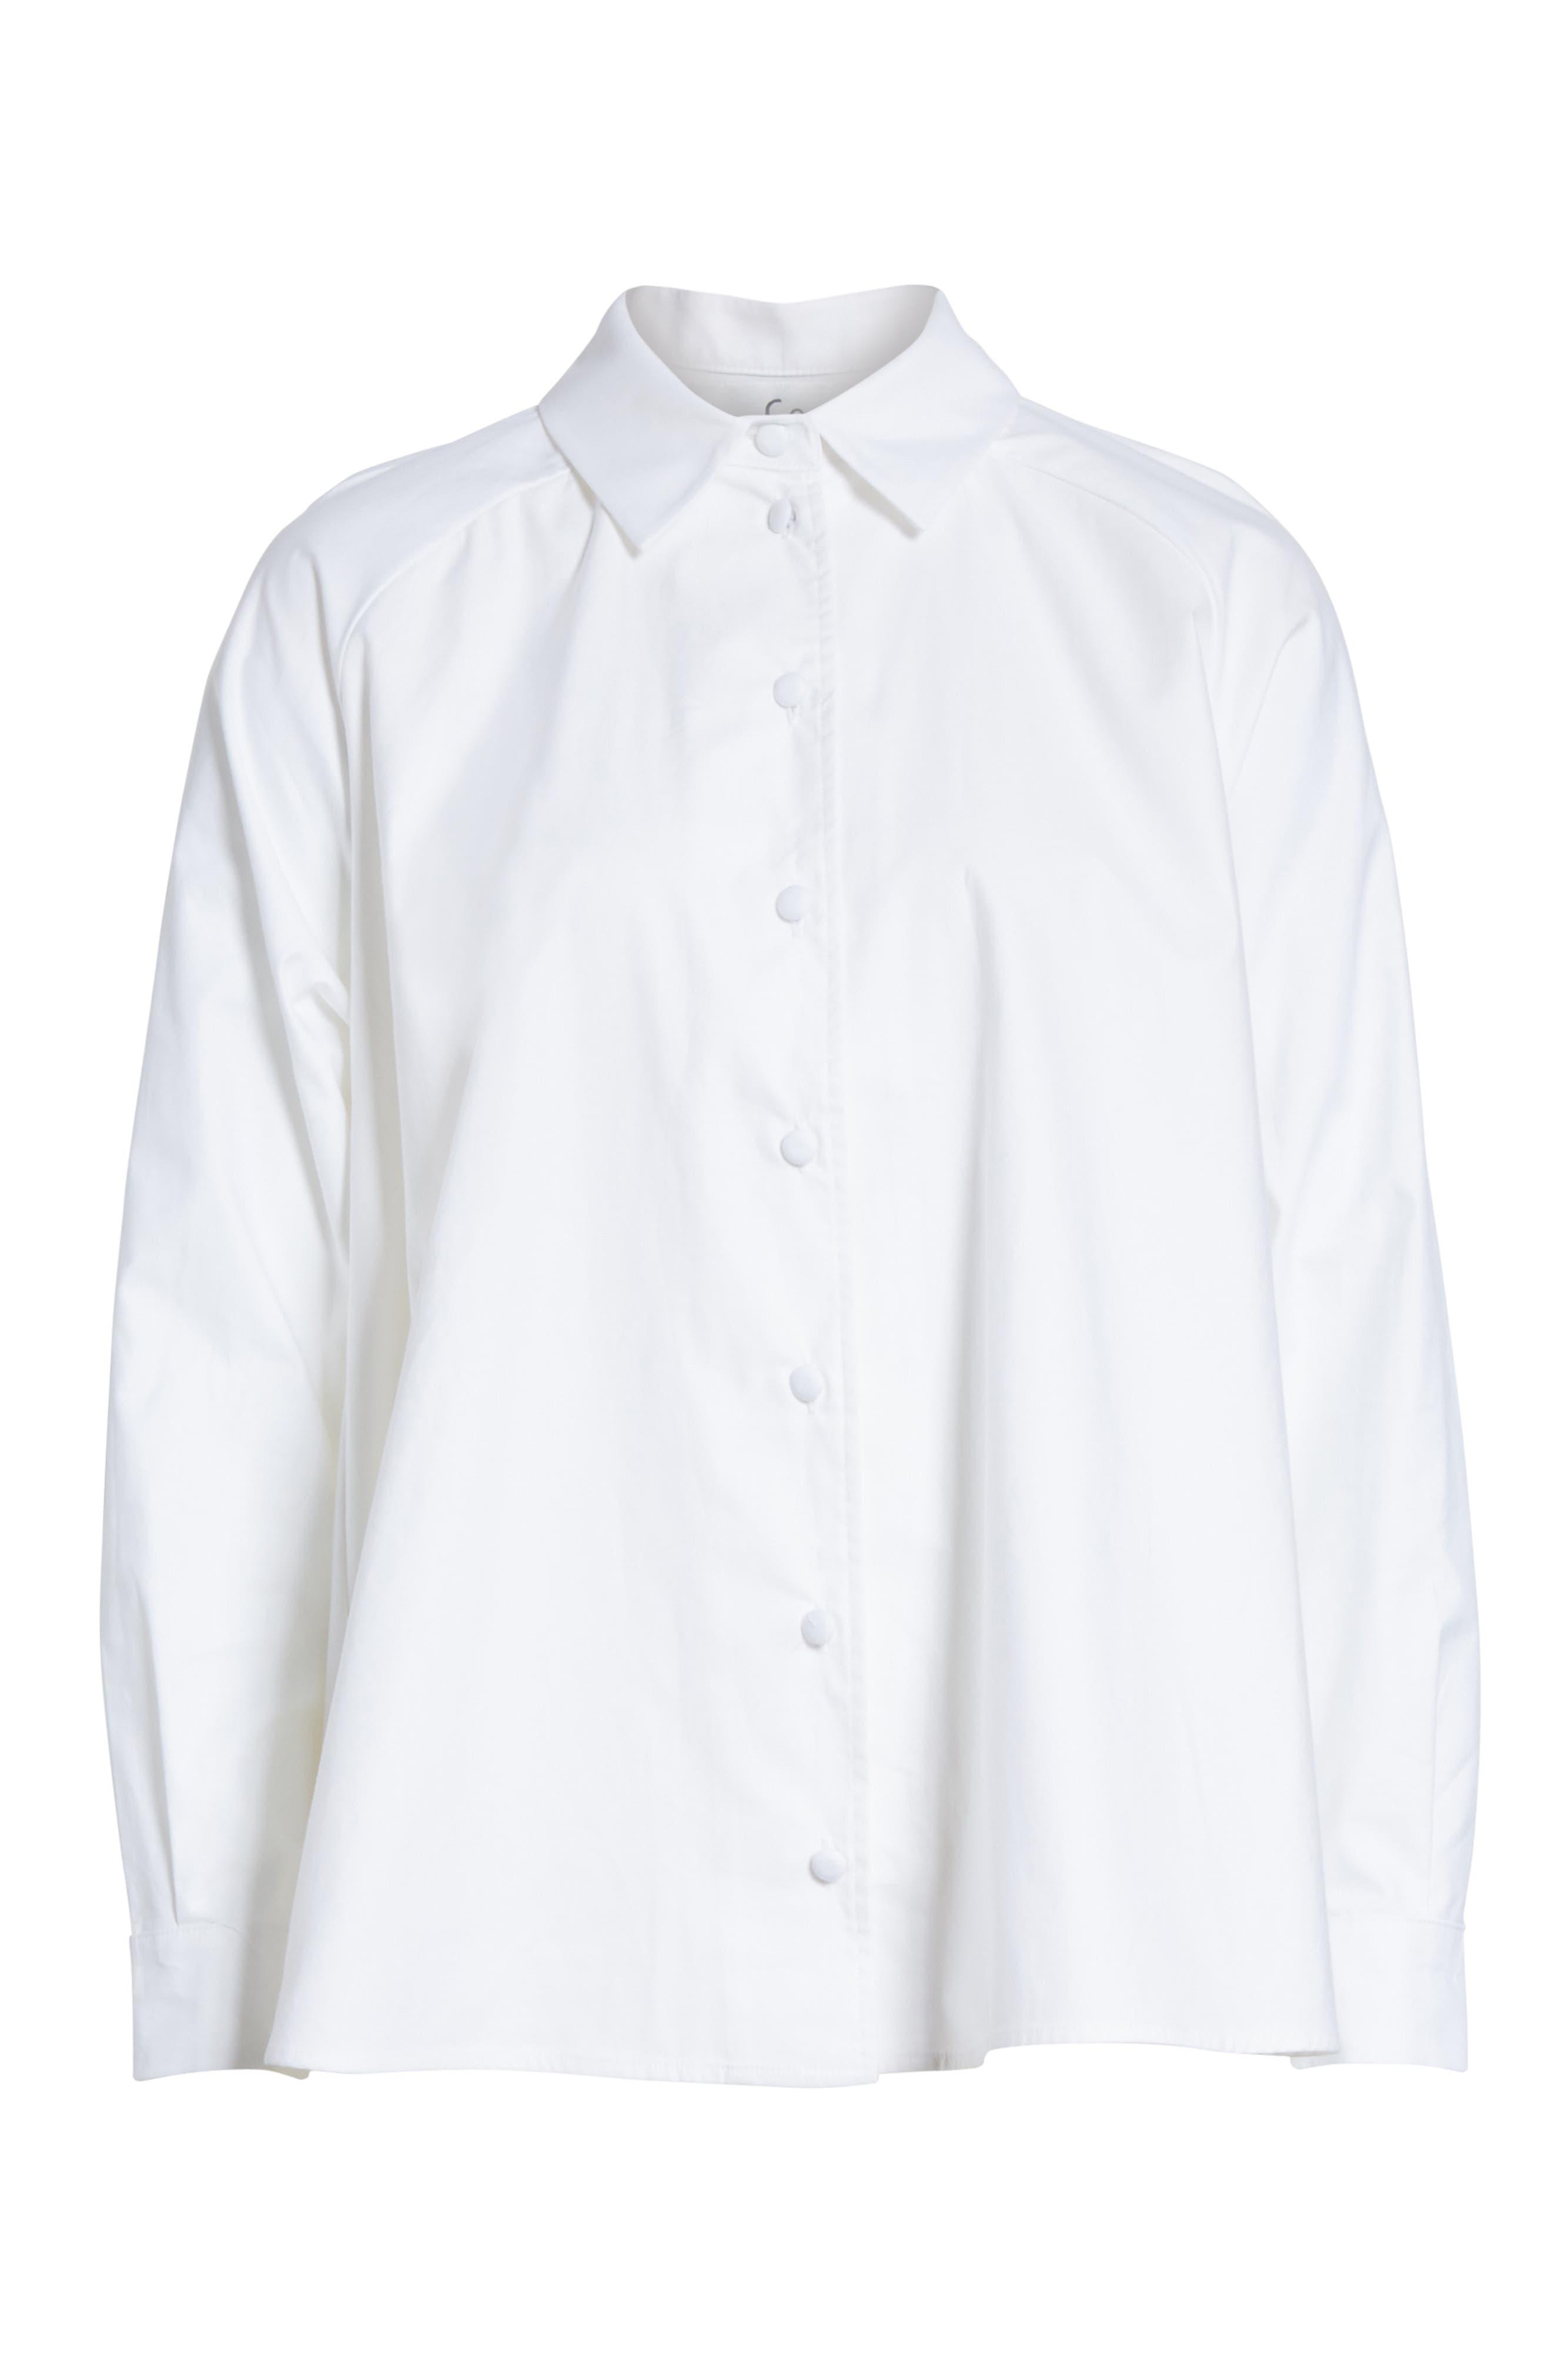 Cotton Poplin Top,                             Alternate thumbnail 6, color,                             White